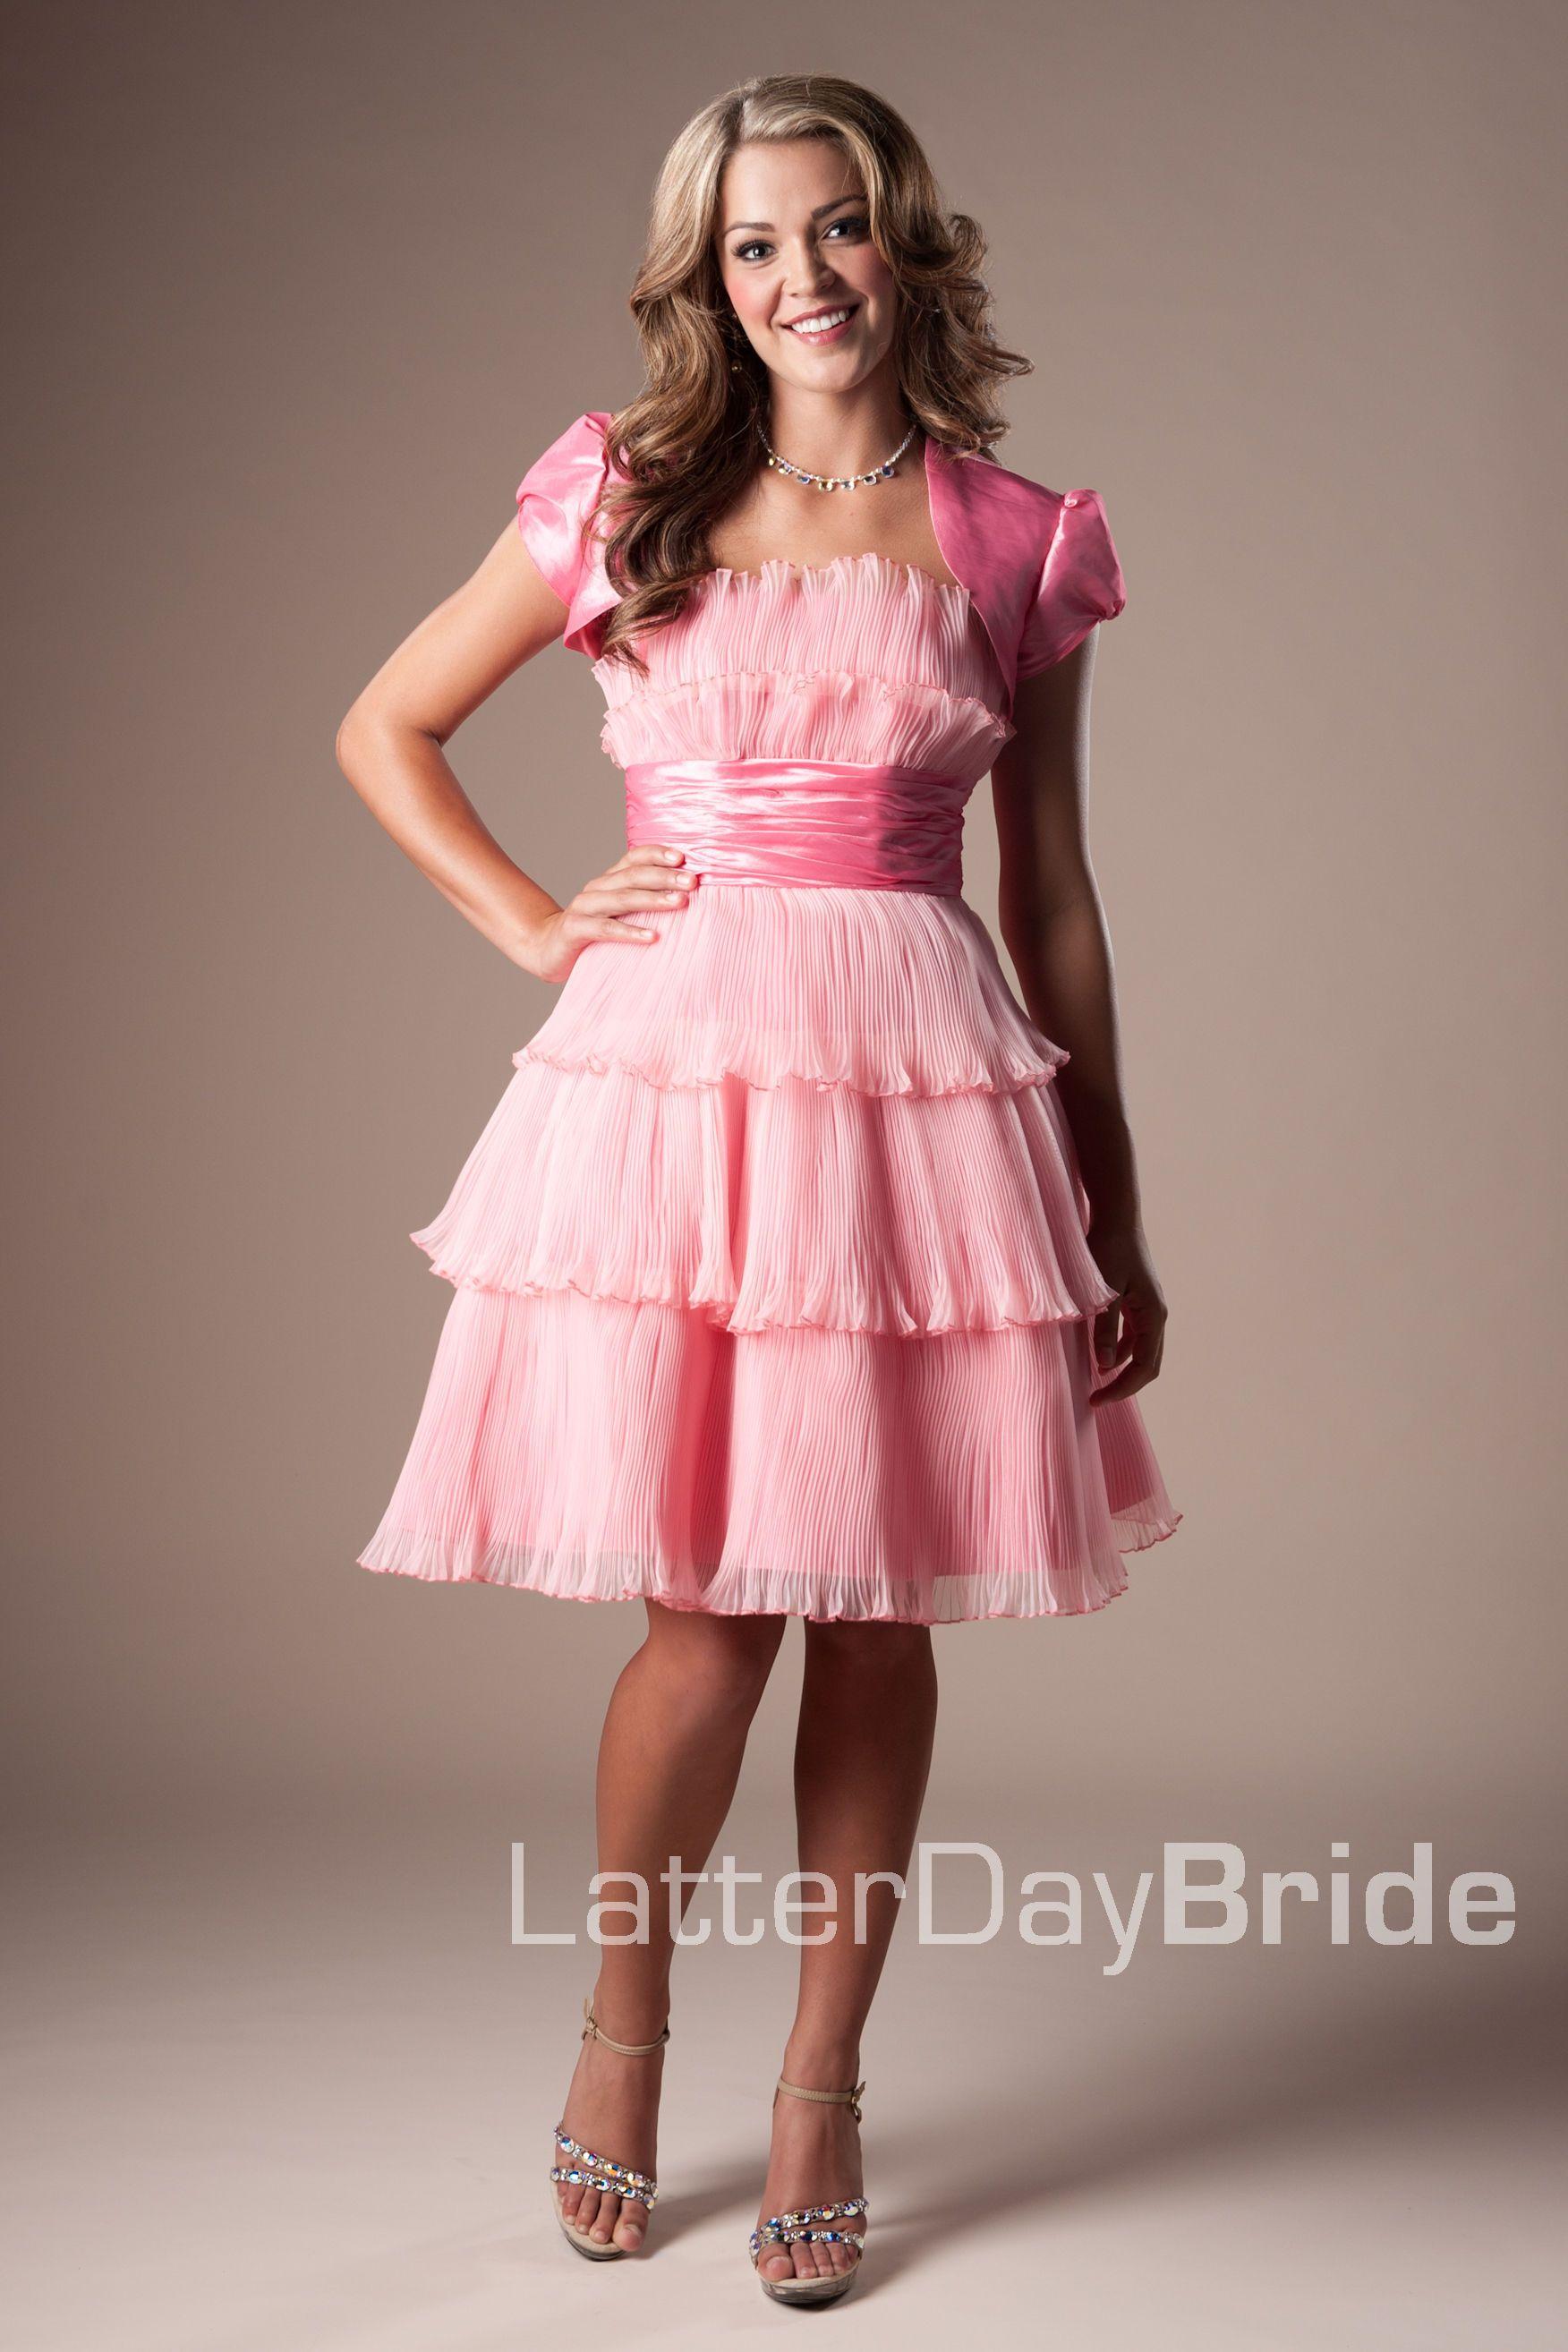 Bridesmaid & Prom, Ruby   LatterDayBride & Prom -Modest Mormon LDS ...